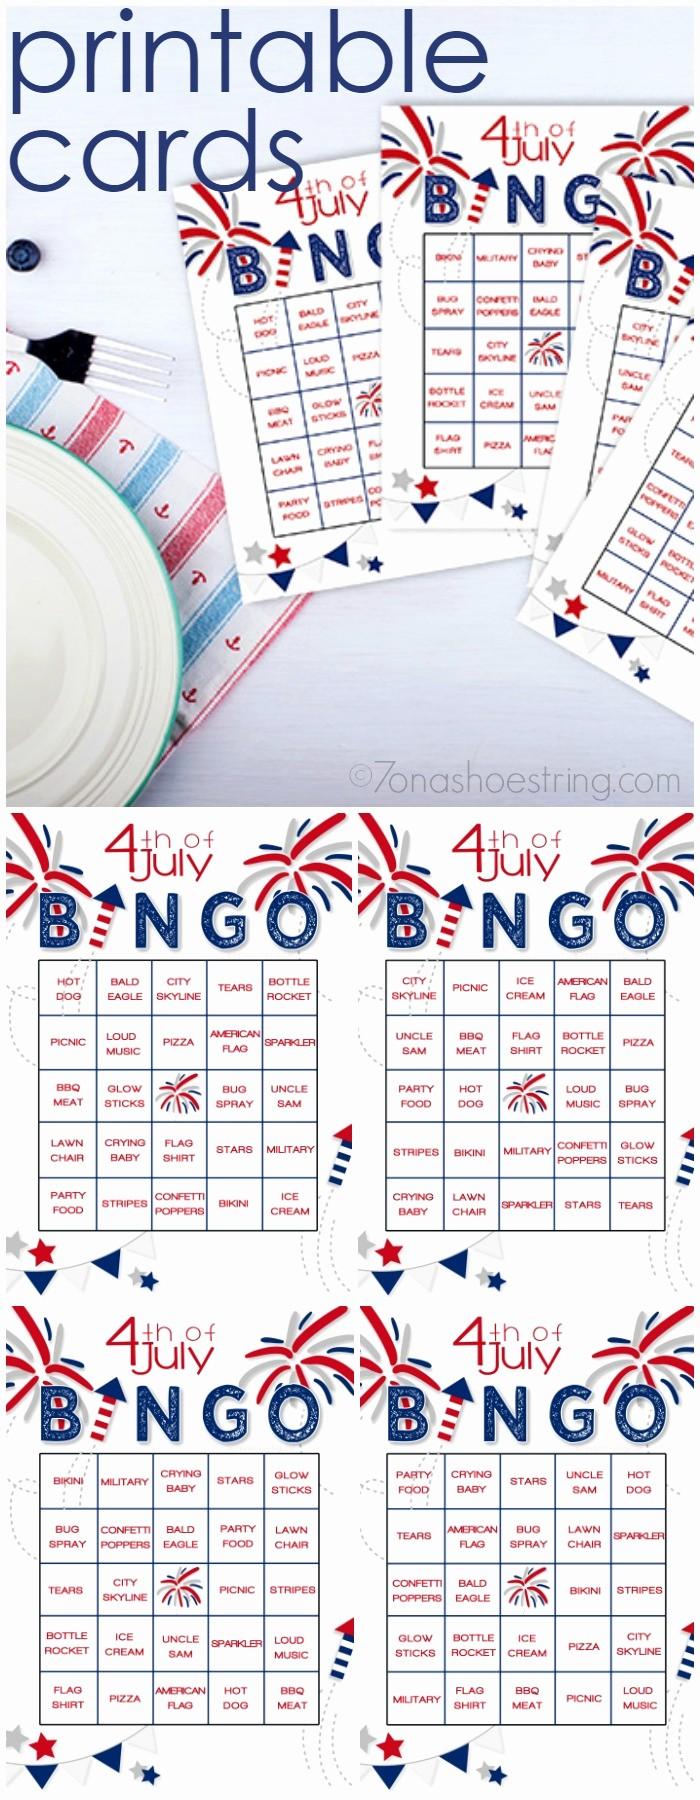 4th Of July Cards Printable Elegant Printable 4th Of July Bingo Adds Fun to Patriotic Celebrations